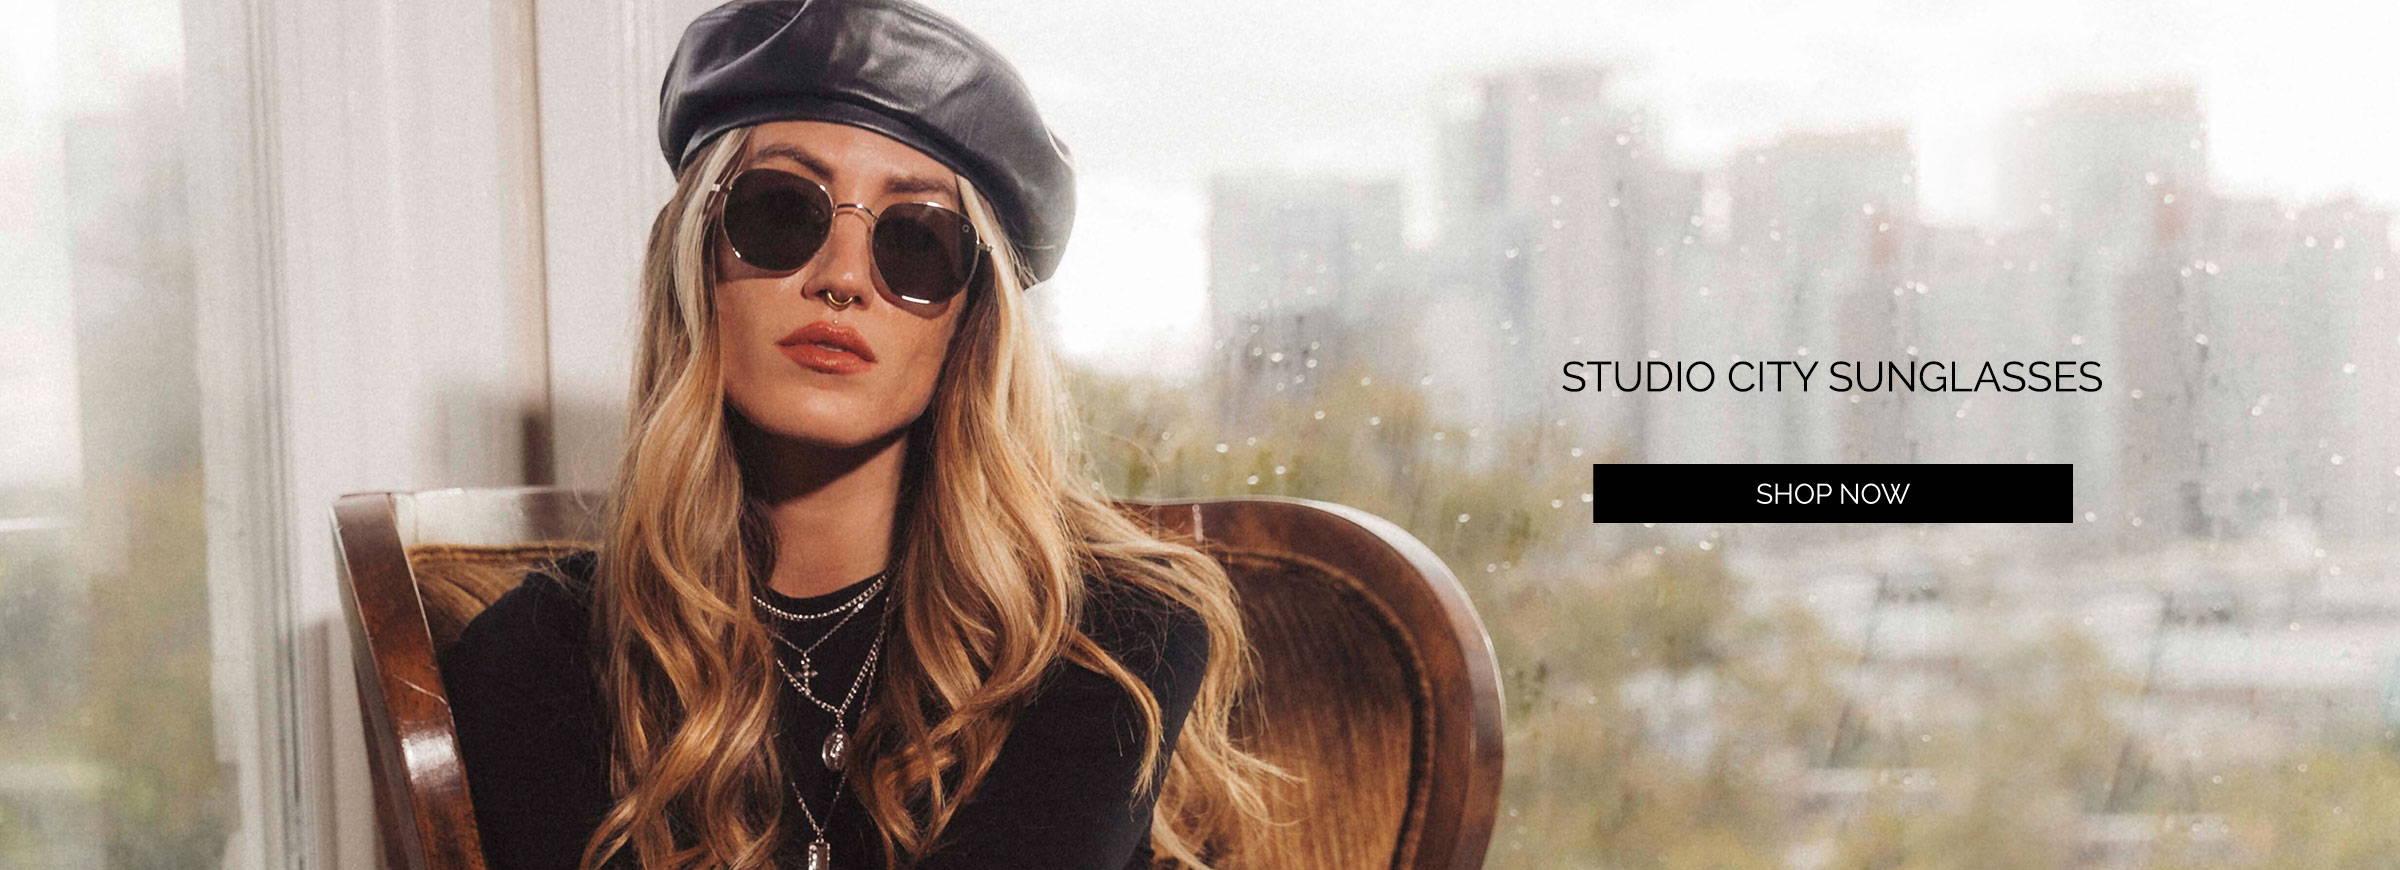 Studio City Sunglasses